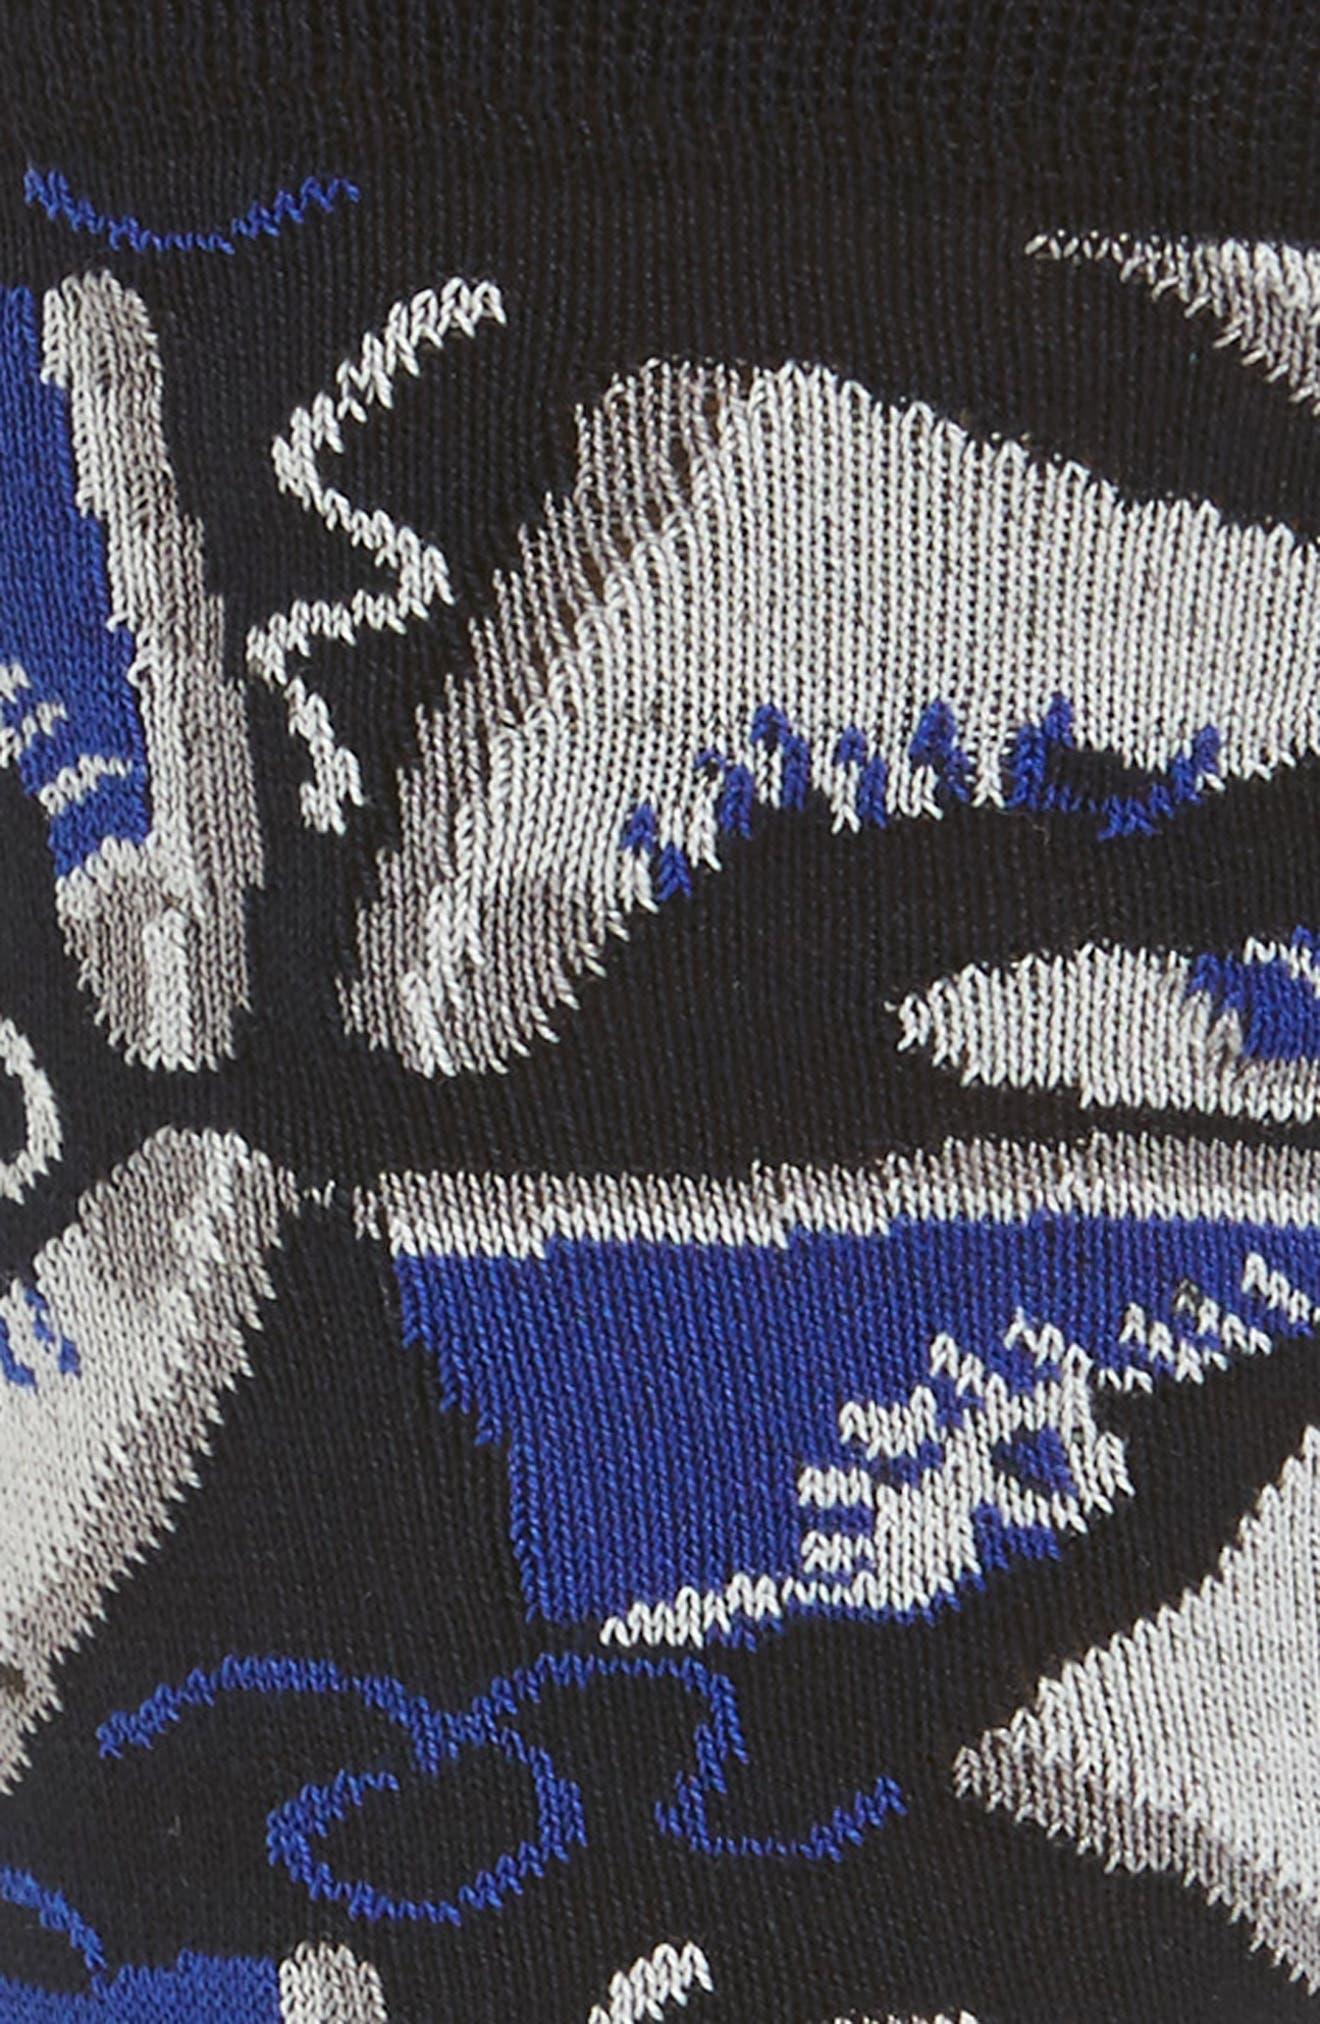 Sneaker Patterned Socks,                             Alternate thumbnail 2, color,                             Classic Blue